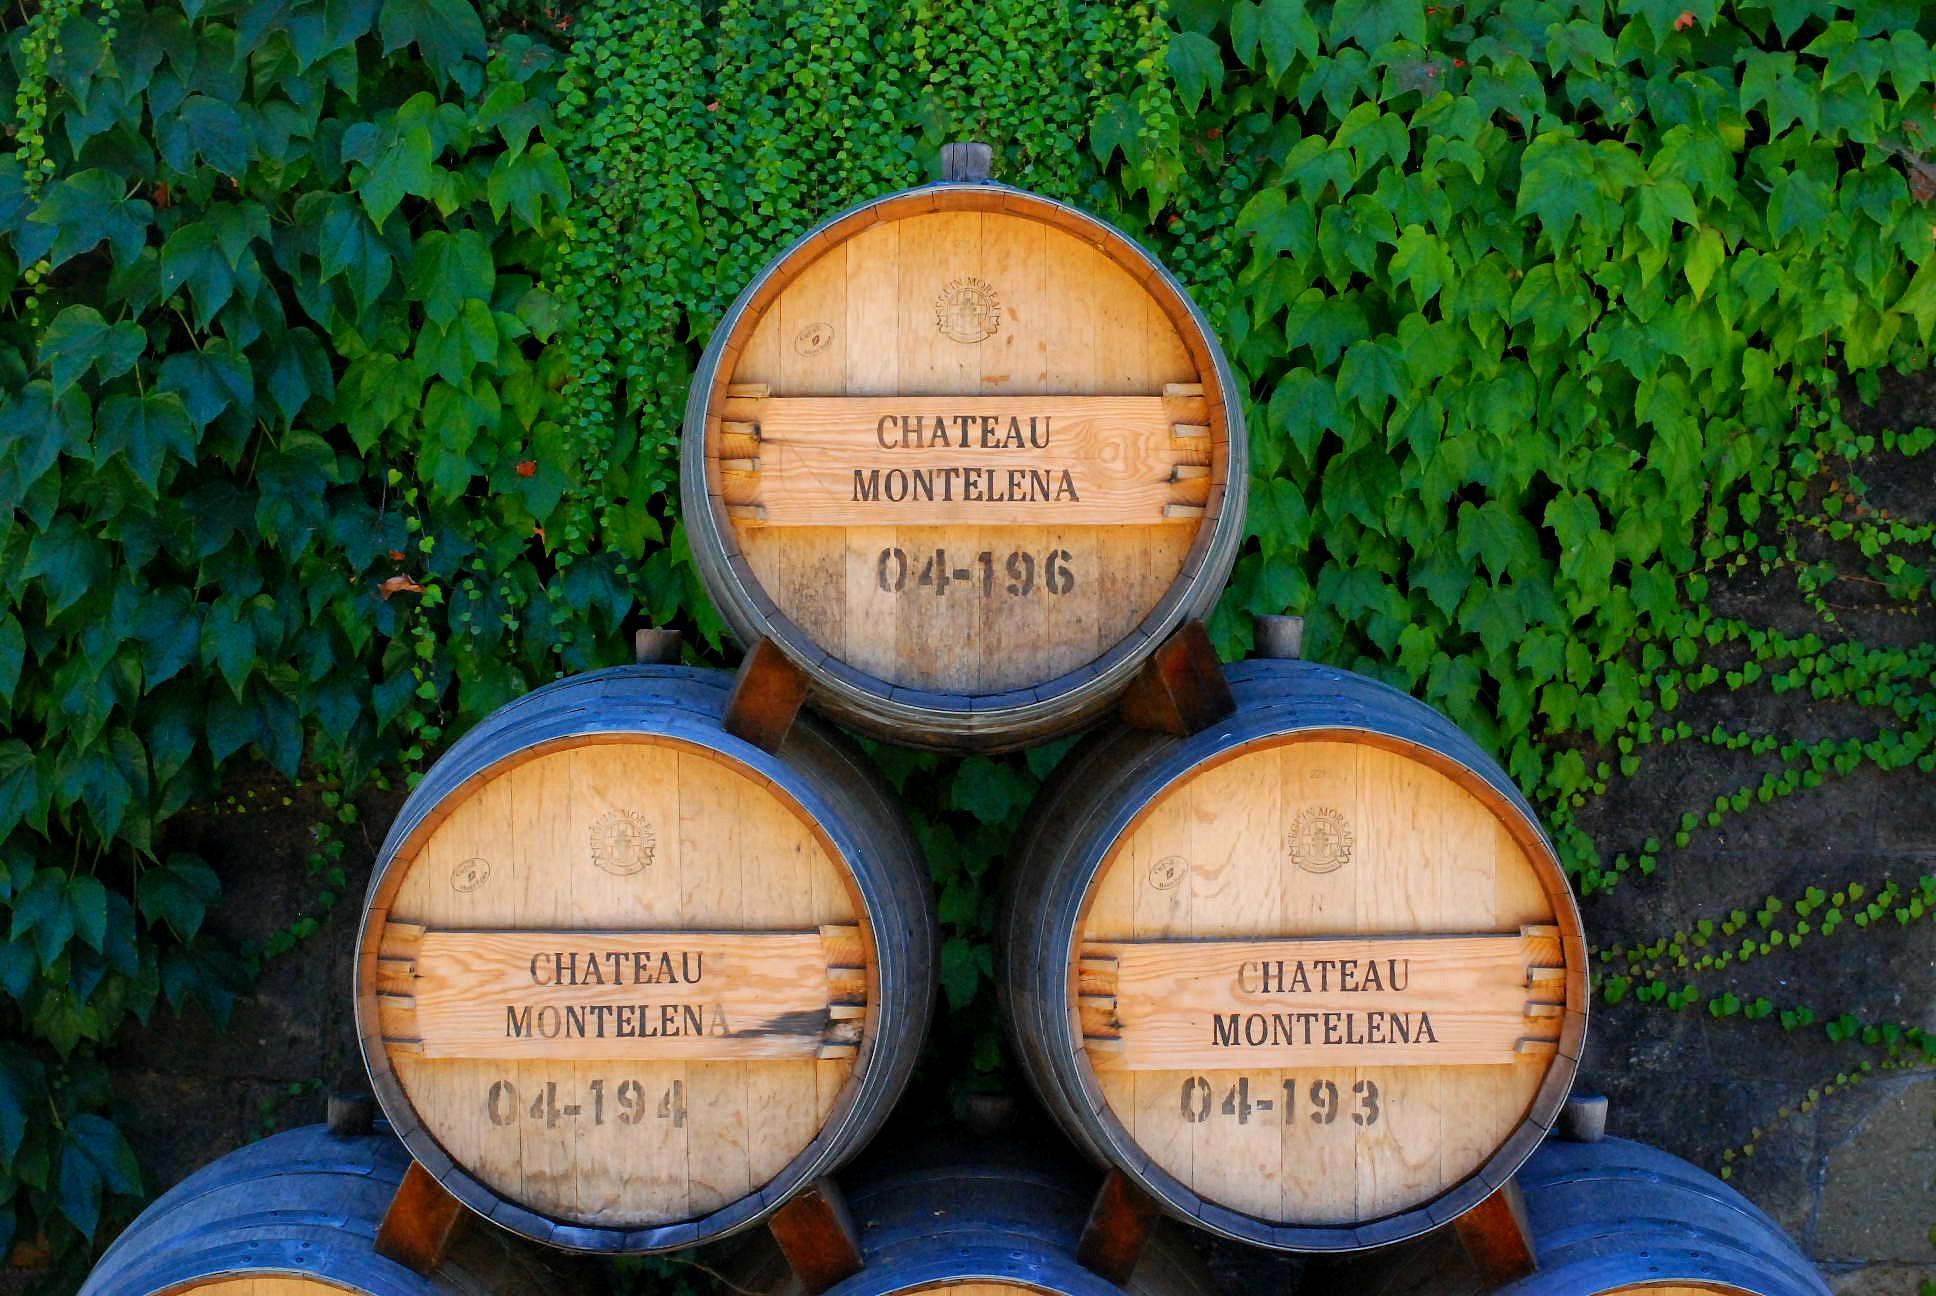 Chateau Montelena Winery. 3 barrels